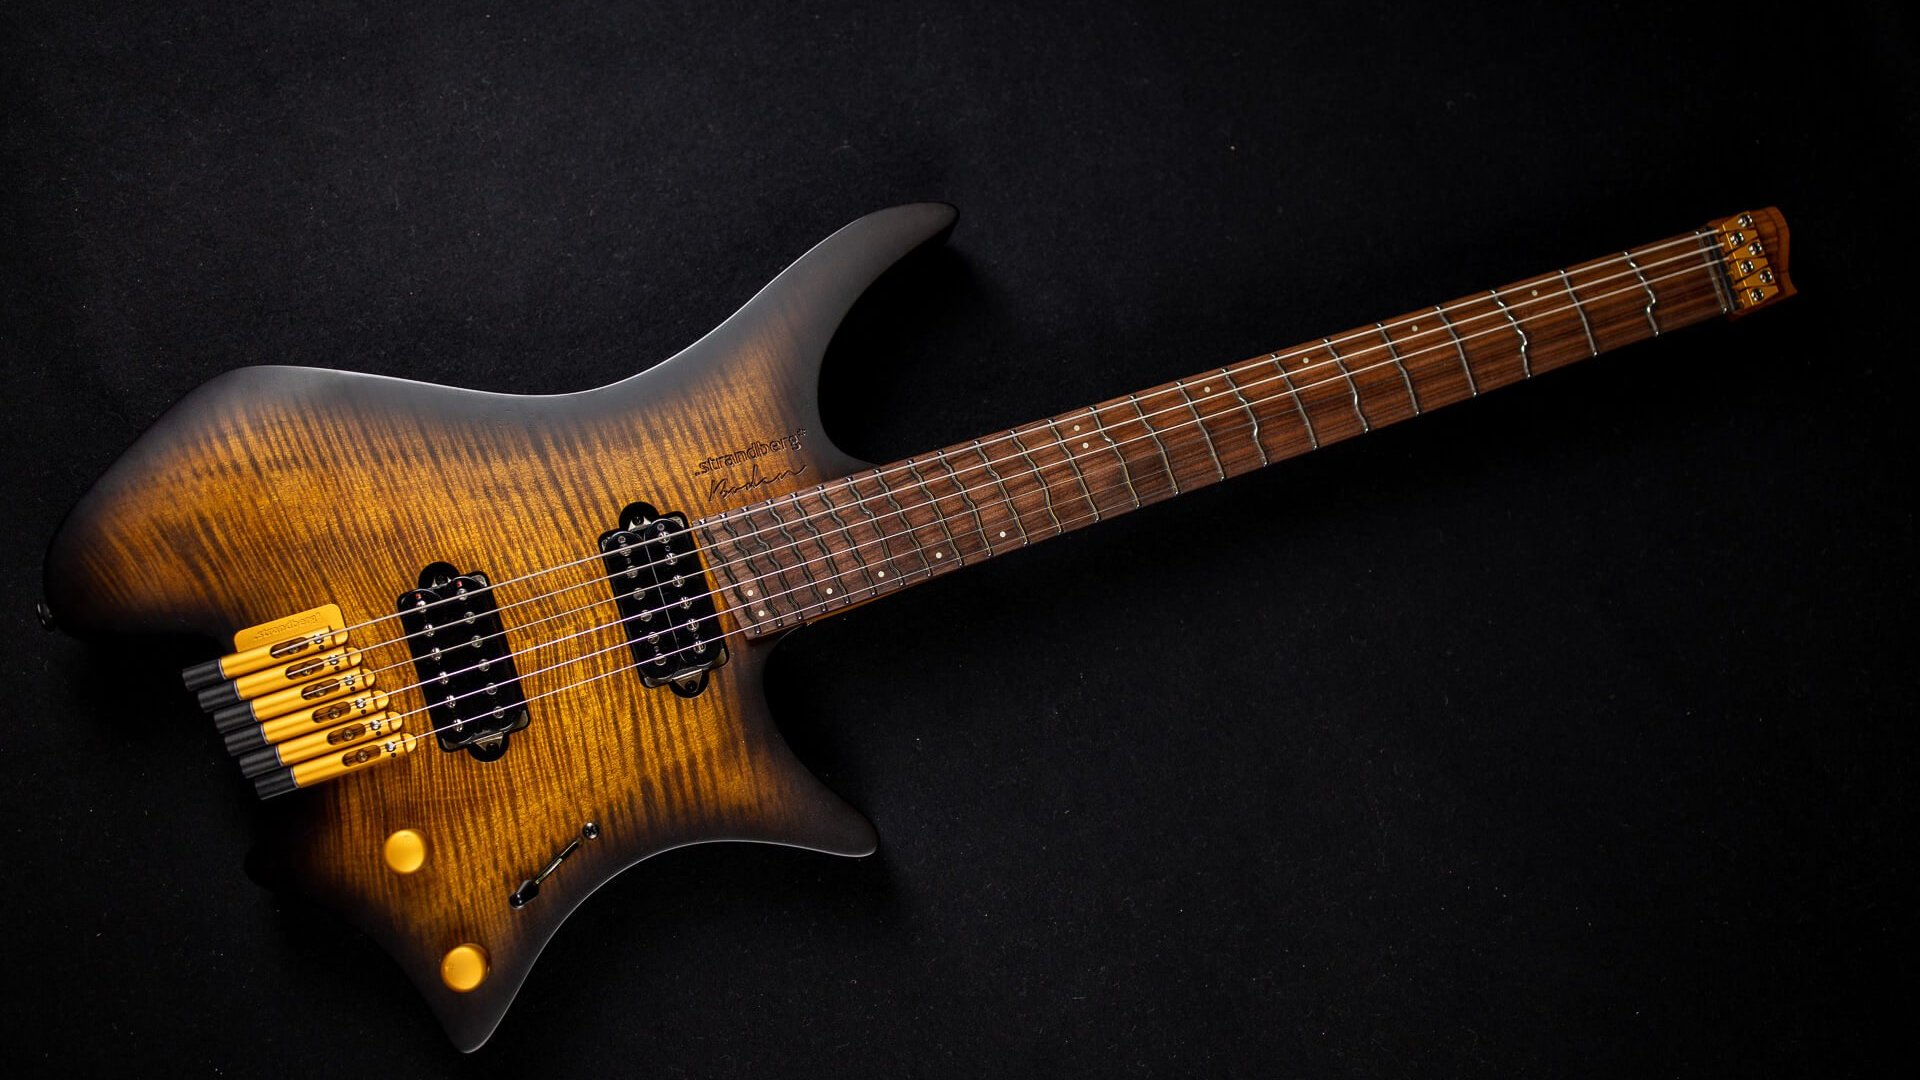 True Temperament Brown Burst 6 string headless guitar front view